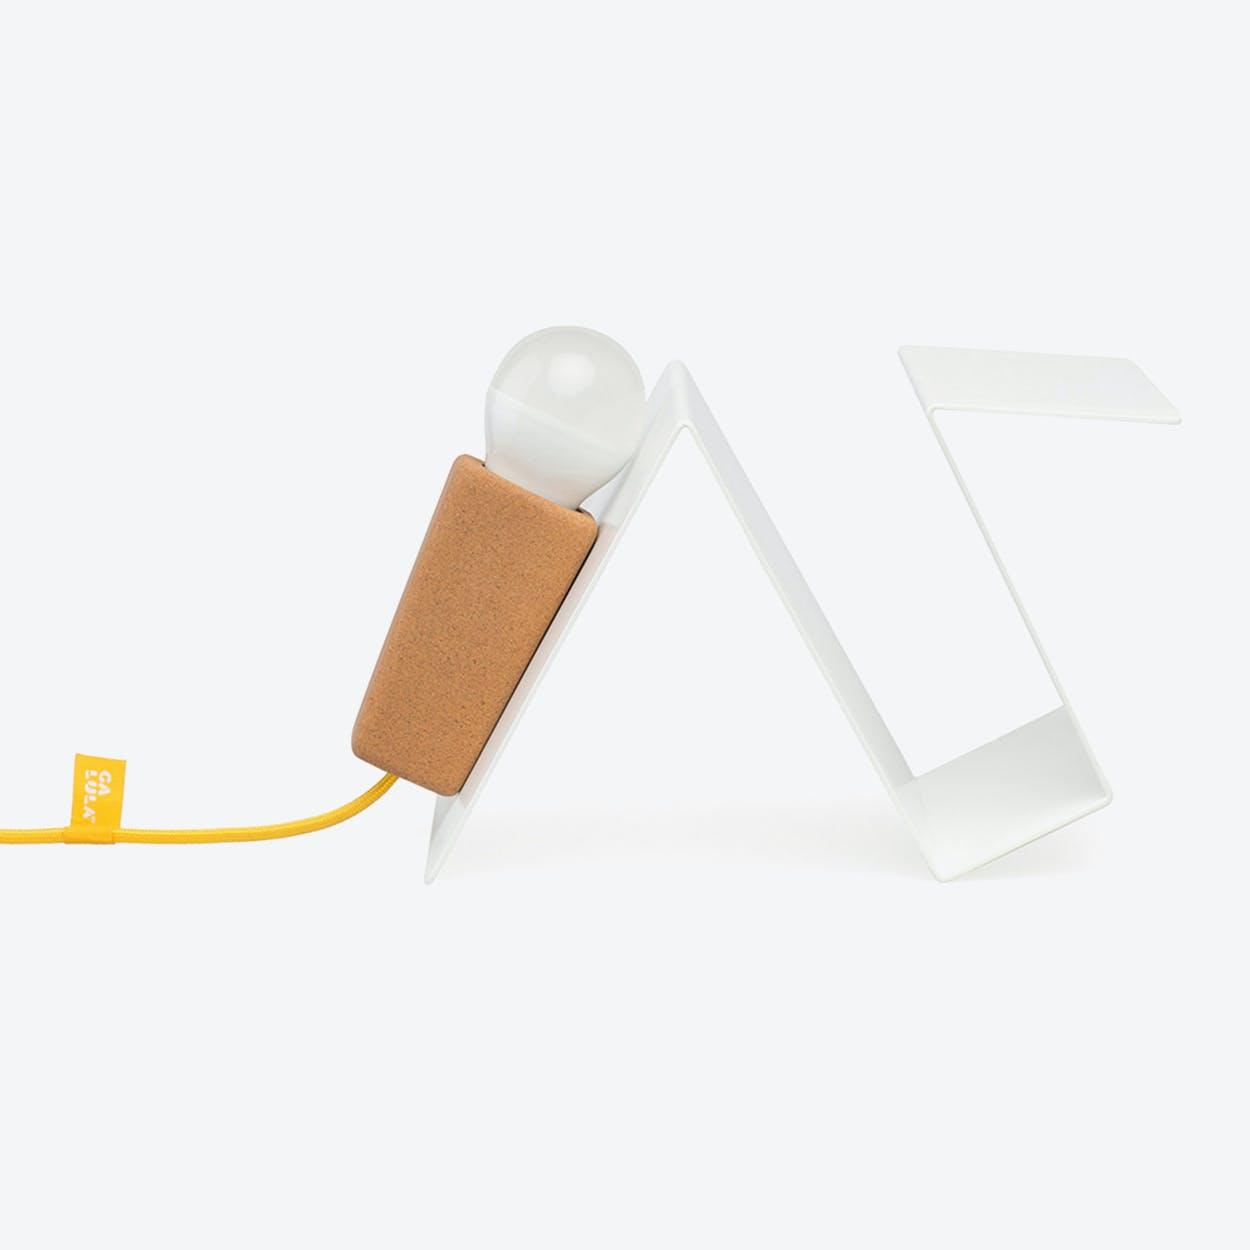 Glint Desk Lamp #3 in White Base & Yellow Wire